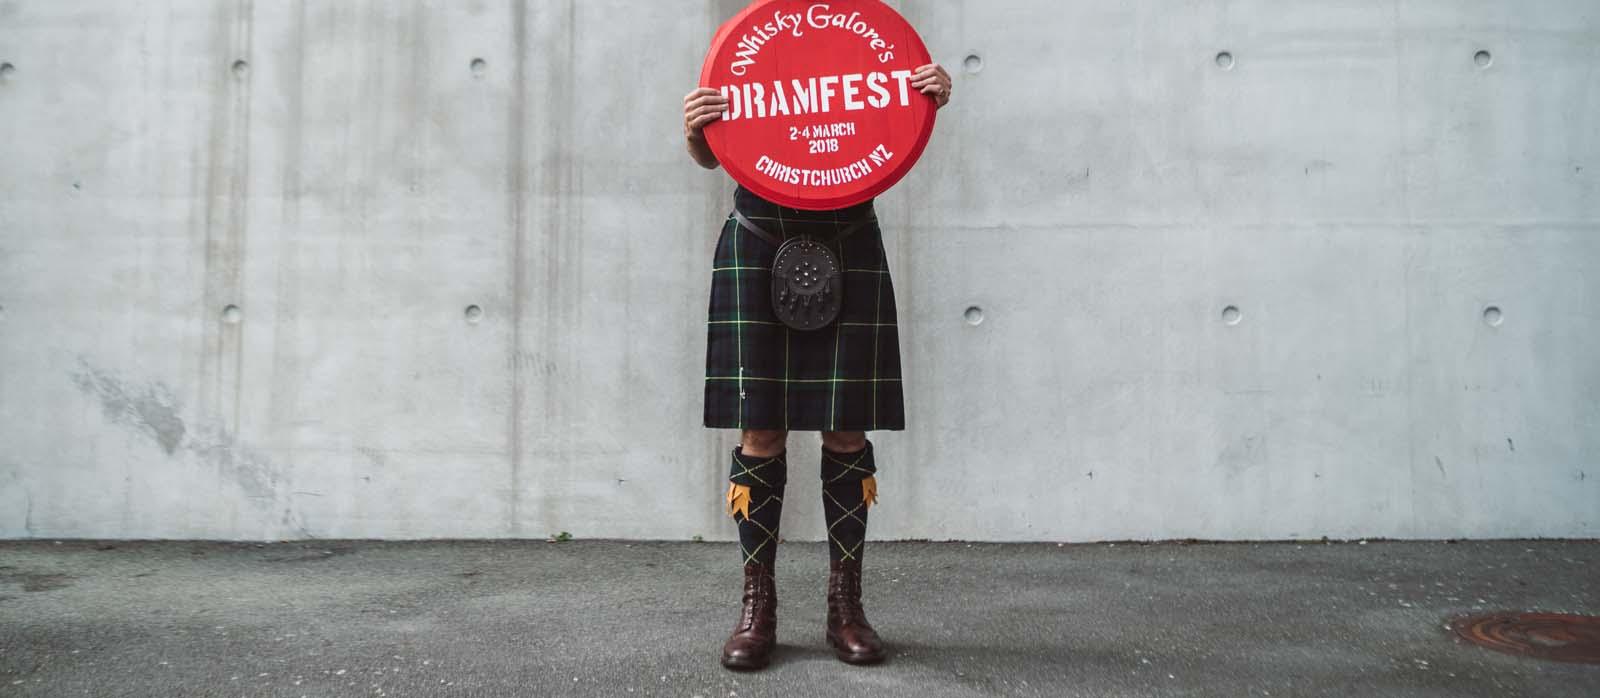 Dramfest 2018 for Whisky Galore-178.jpg